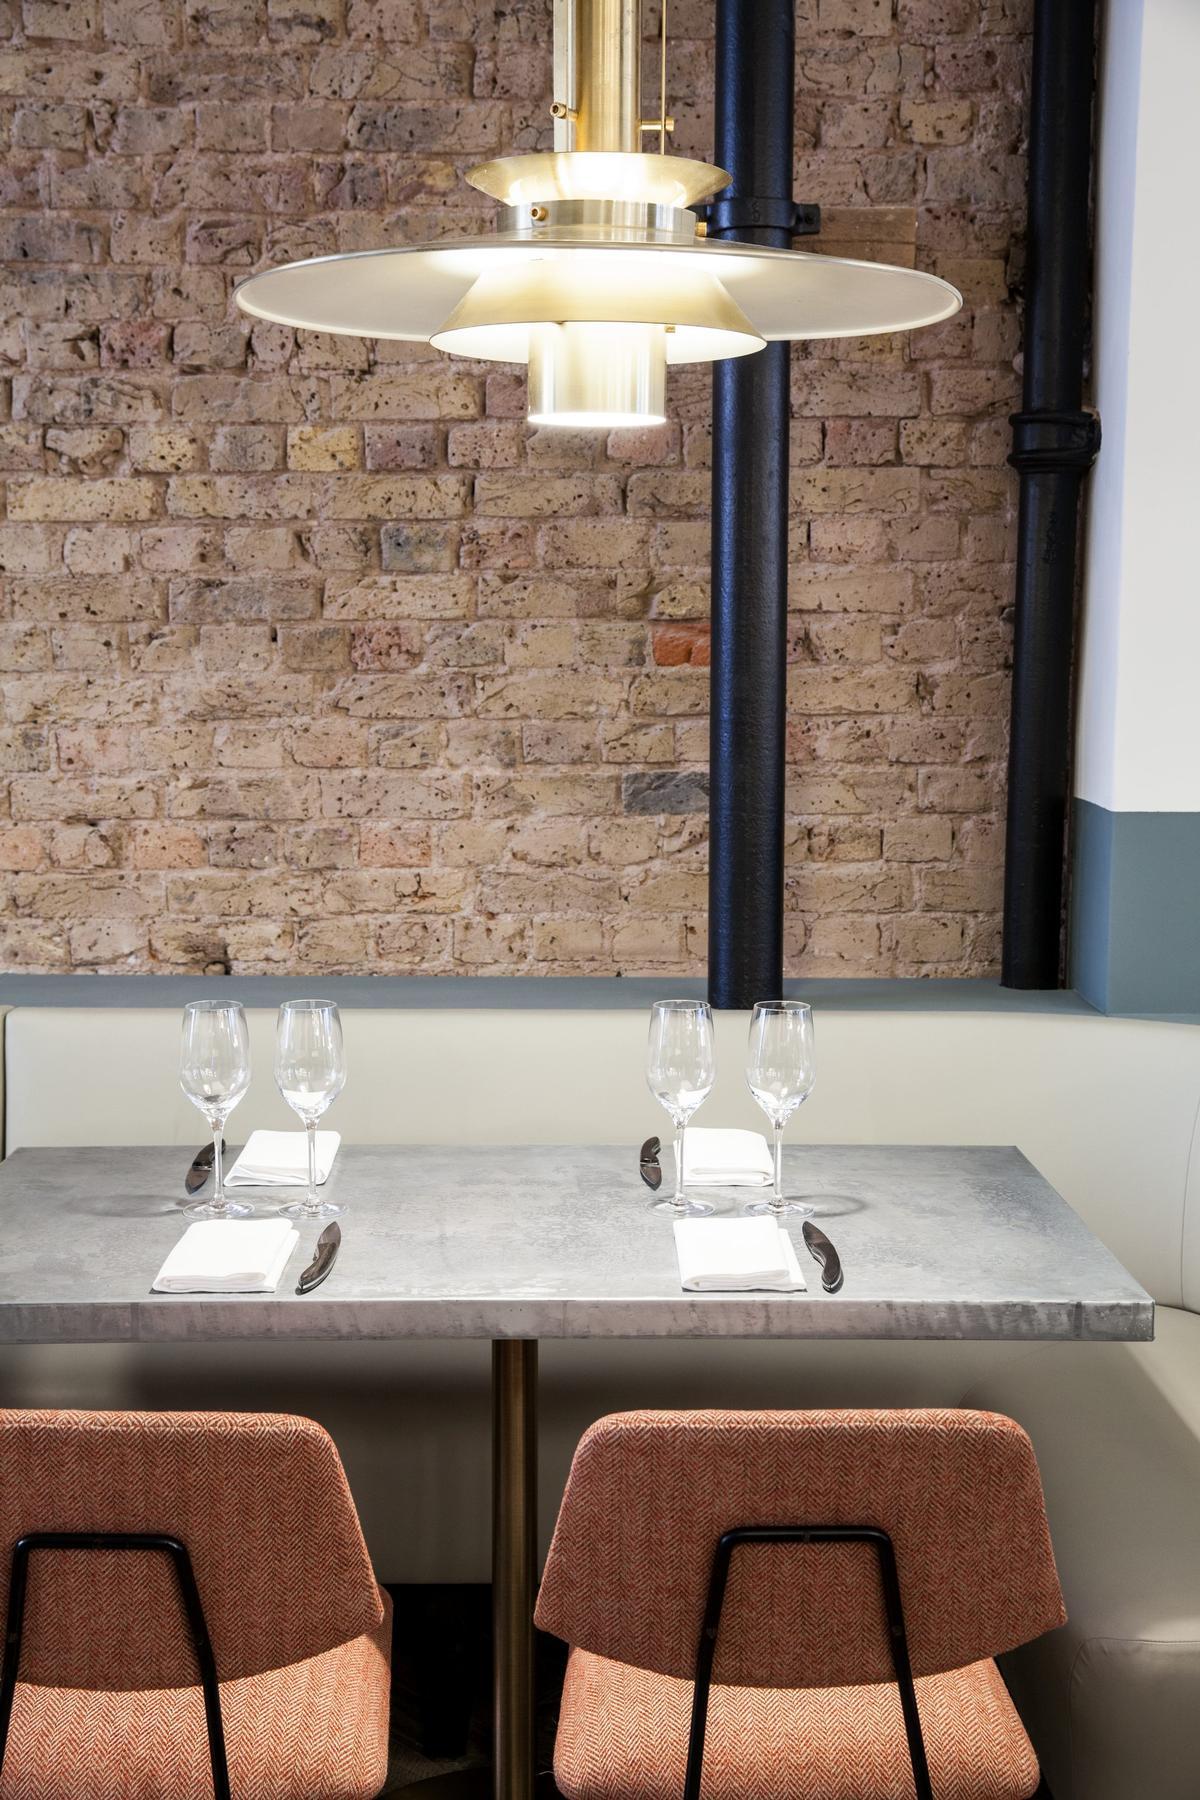 parisian restaurant frenchie opens theatre inspired london